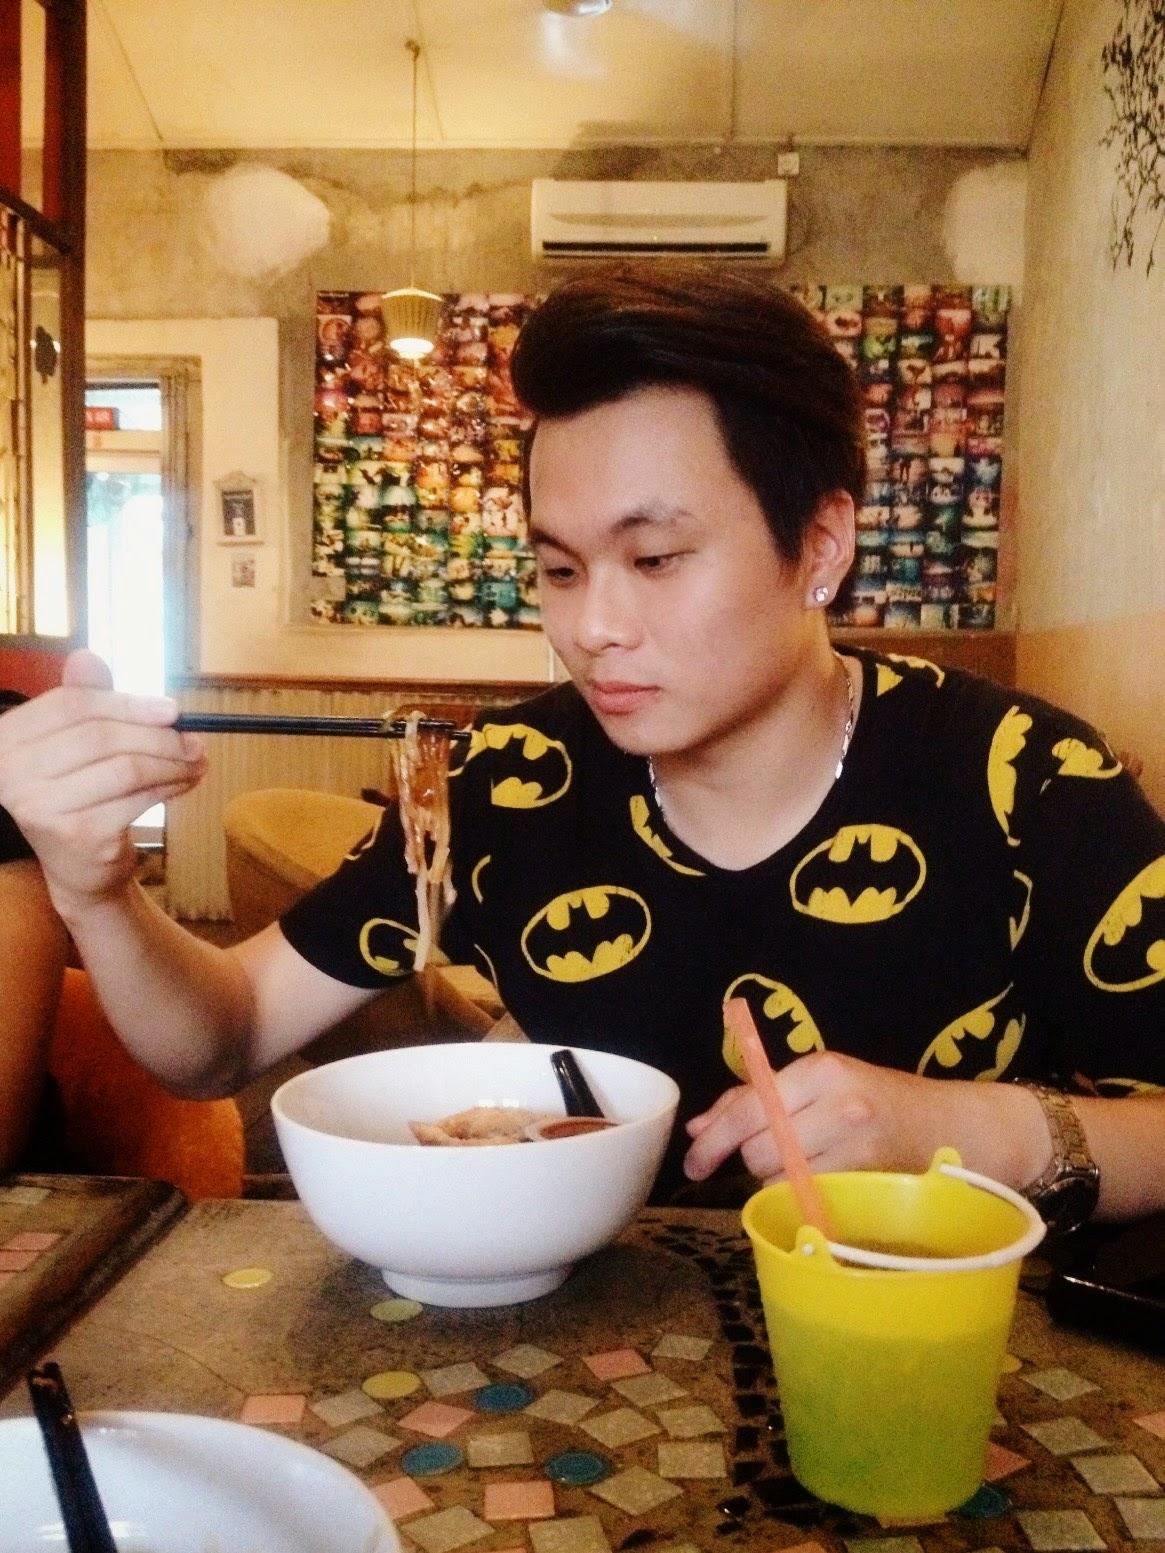 Ray Tan 陳學沿 (raytansy) ; Roost Cafe Juice+Bar @ Jalan Dhoby, Johor Bahru, Johor, Malaysia